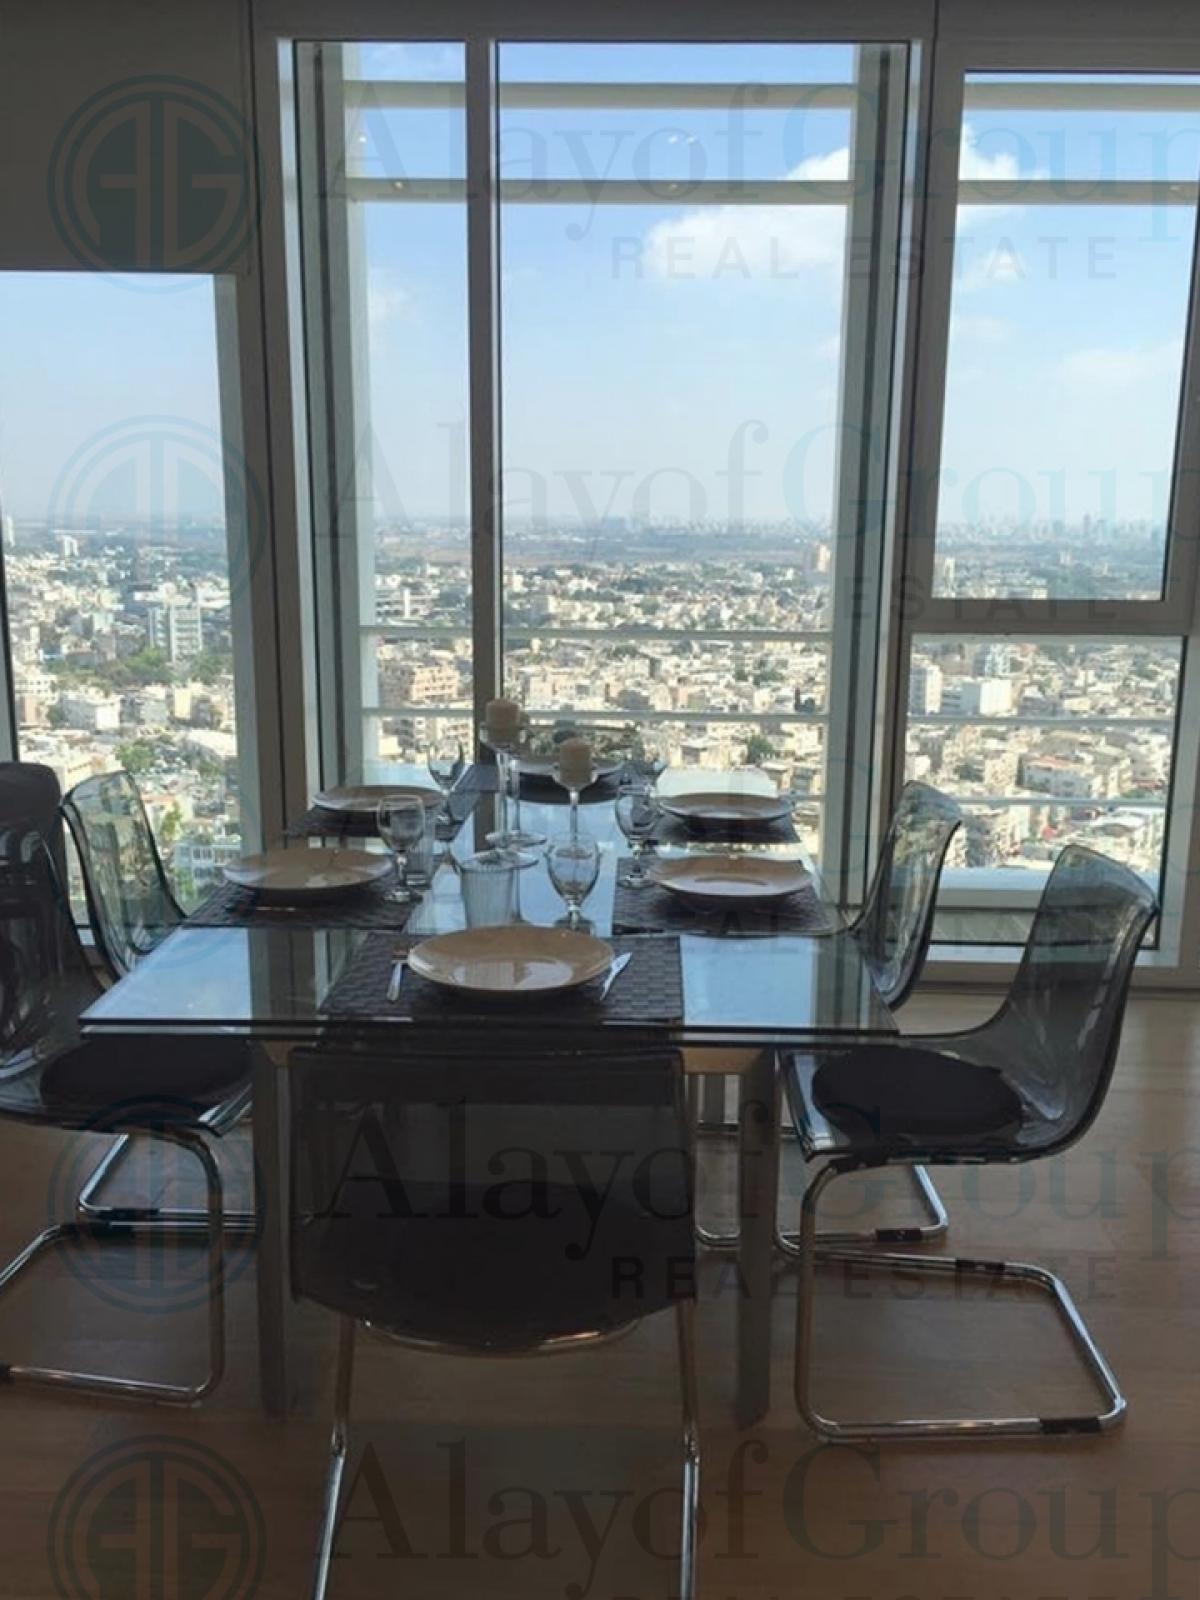 Property listed For Rent in Tel Aviv, Israel